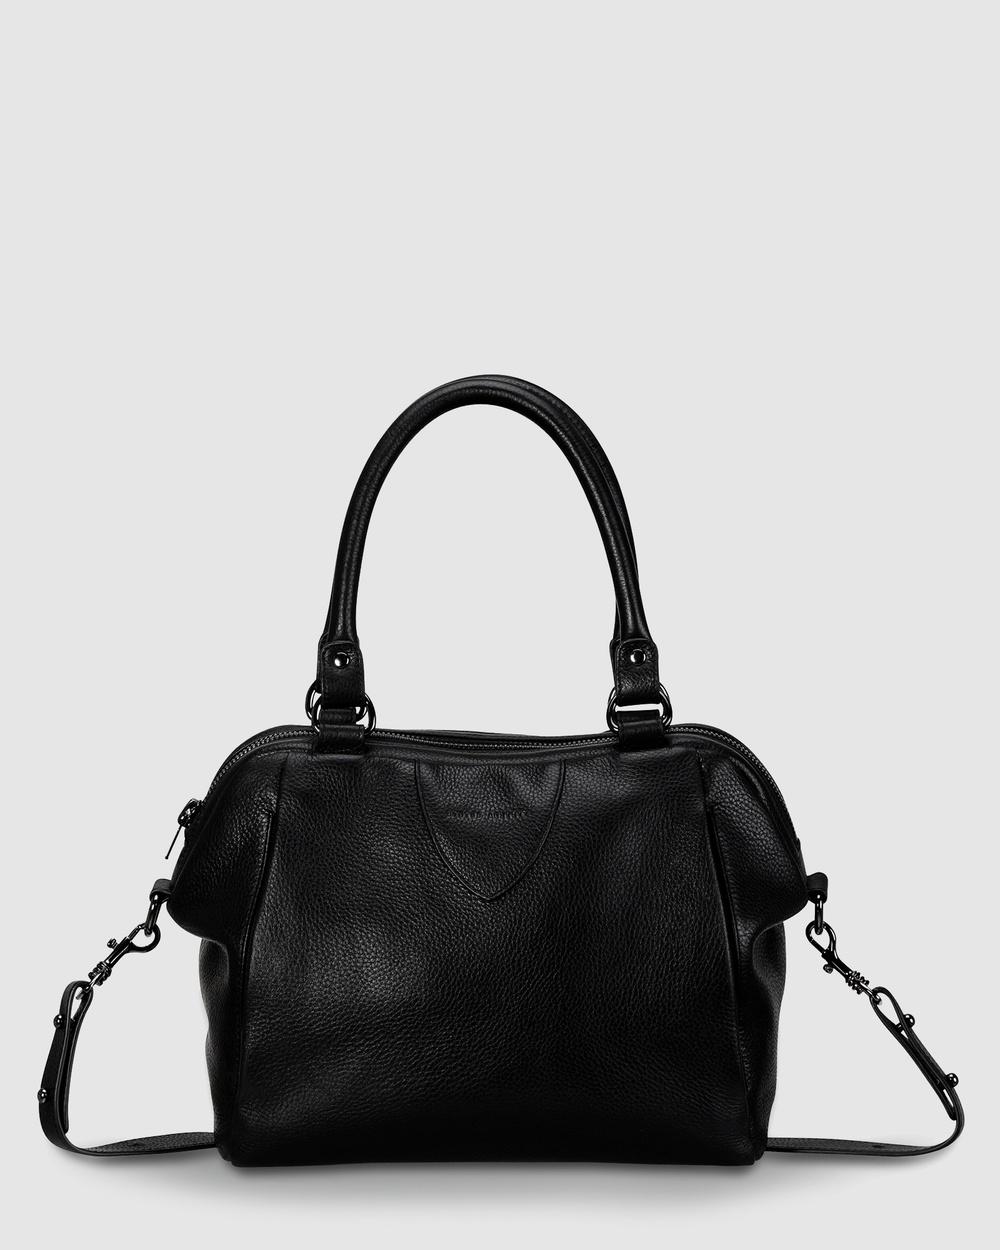 Status Anxiety Force of Being Handbag Satchels Black Leather bags Australia